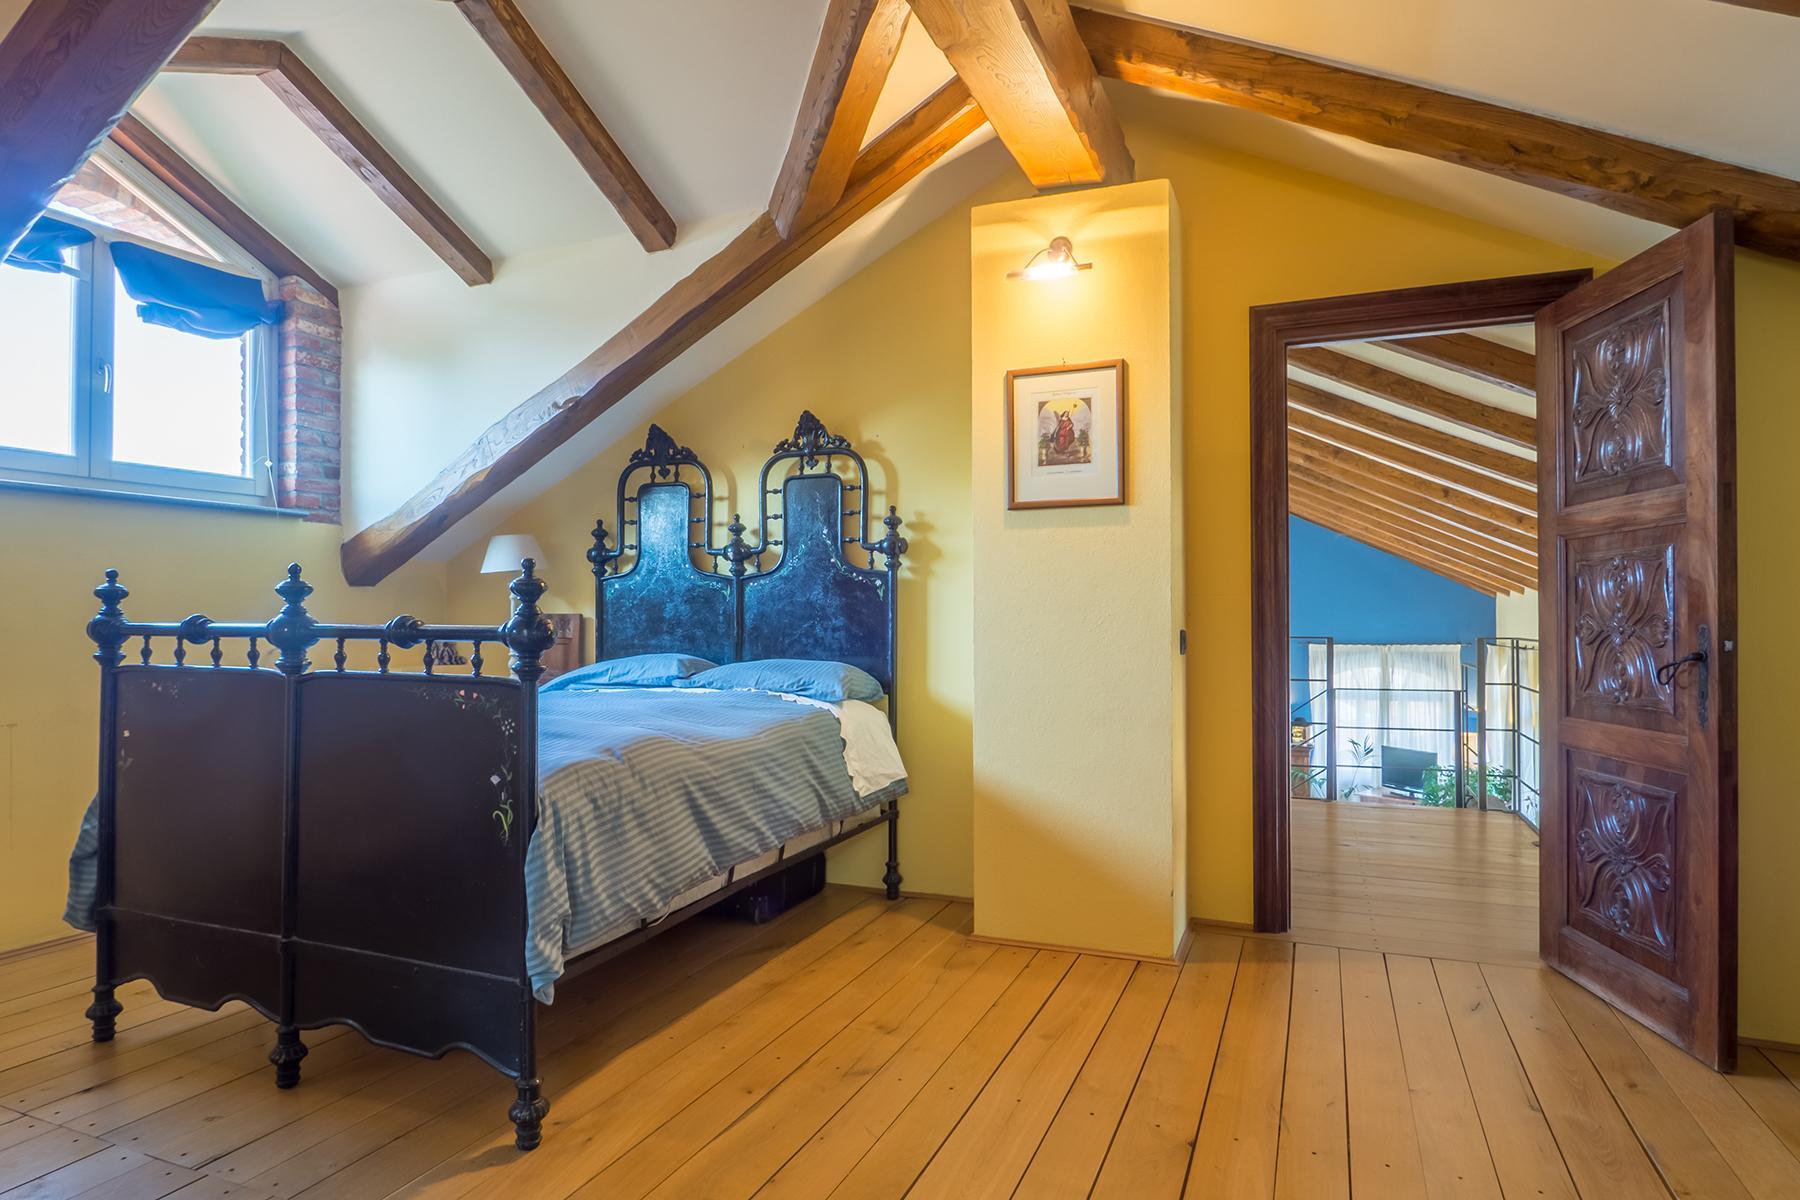 Elegant apartment in the Canavese region - 19